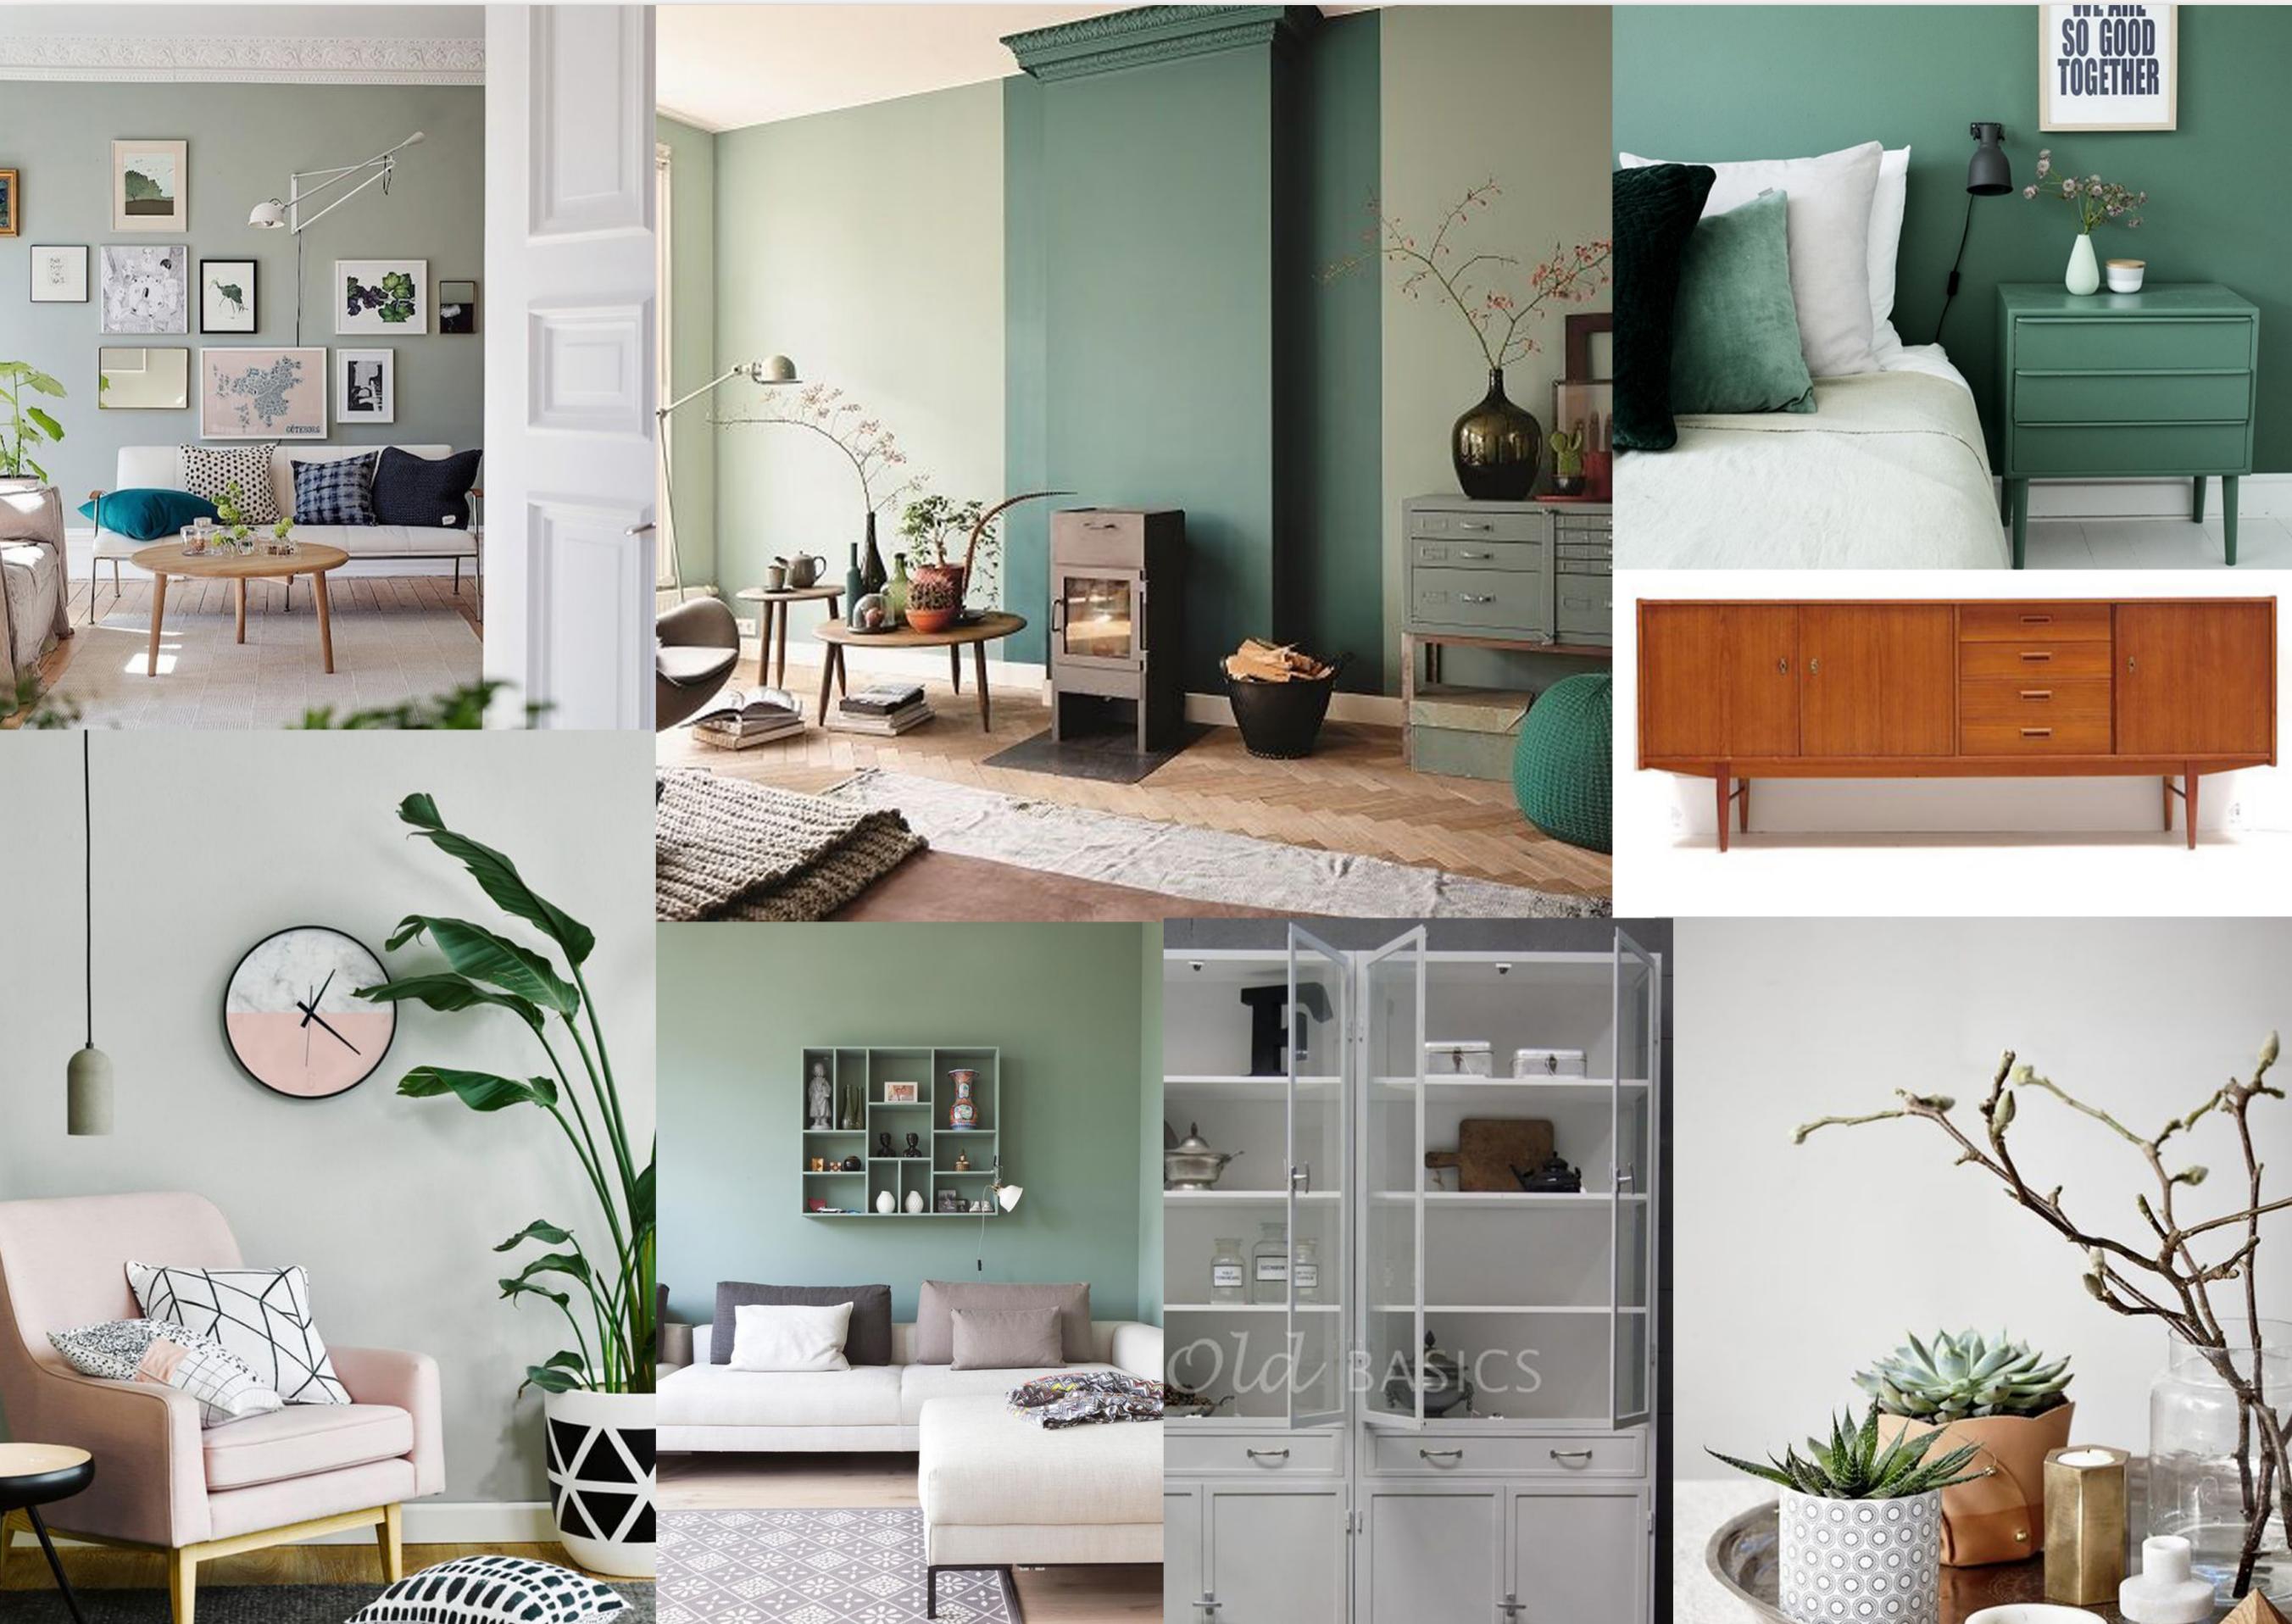 Woonkamer 2 - groen / hout / grijs / roze | Zitkamer | Pinterest